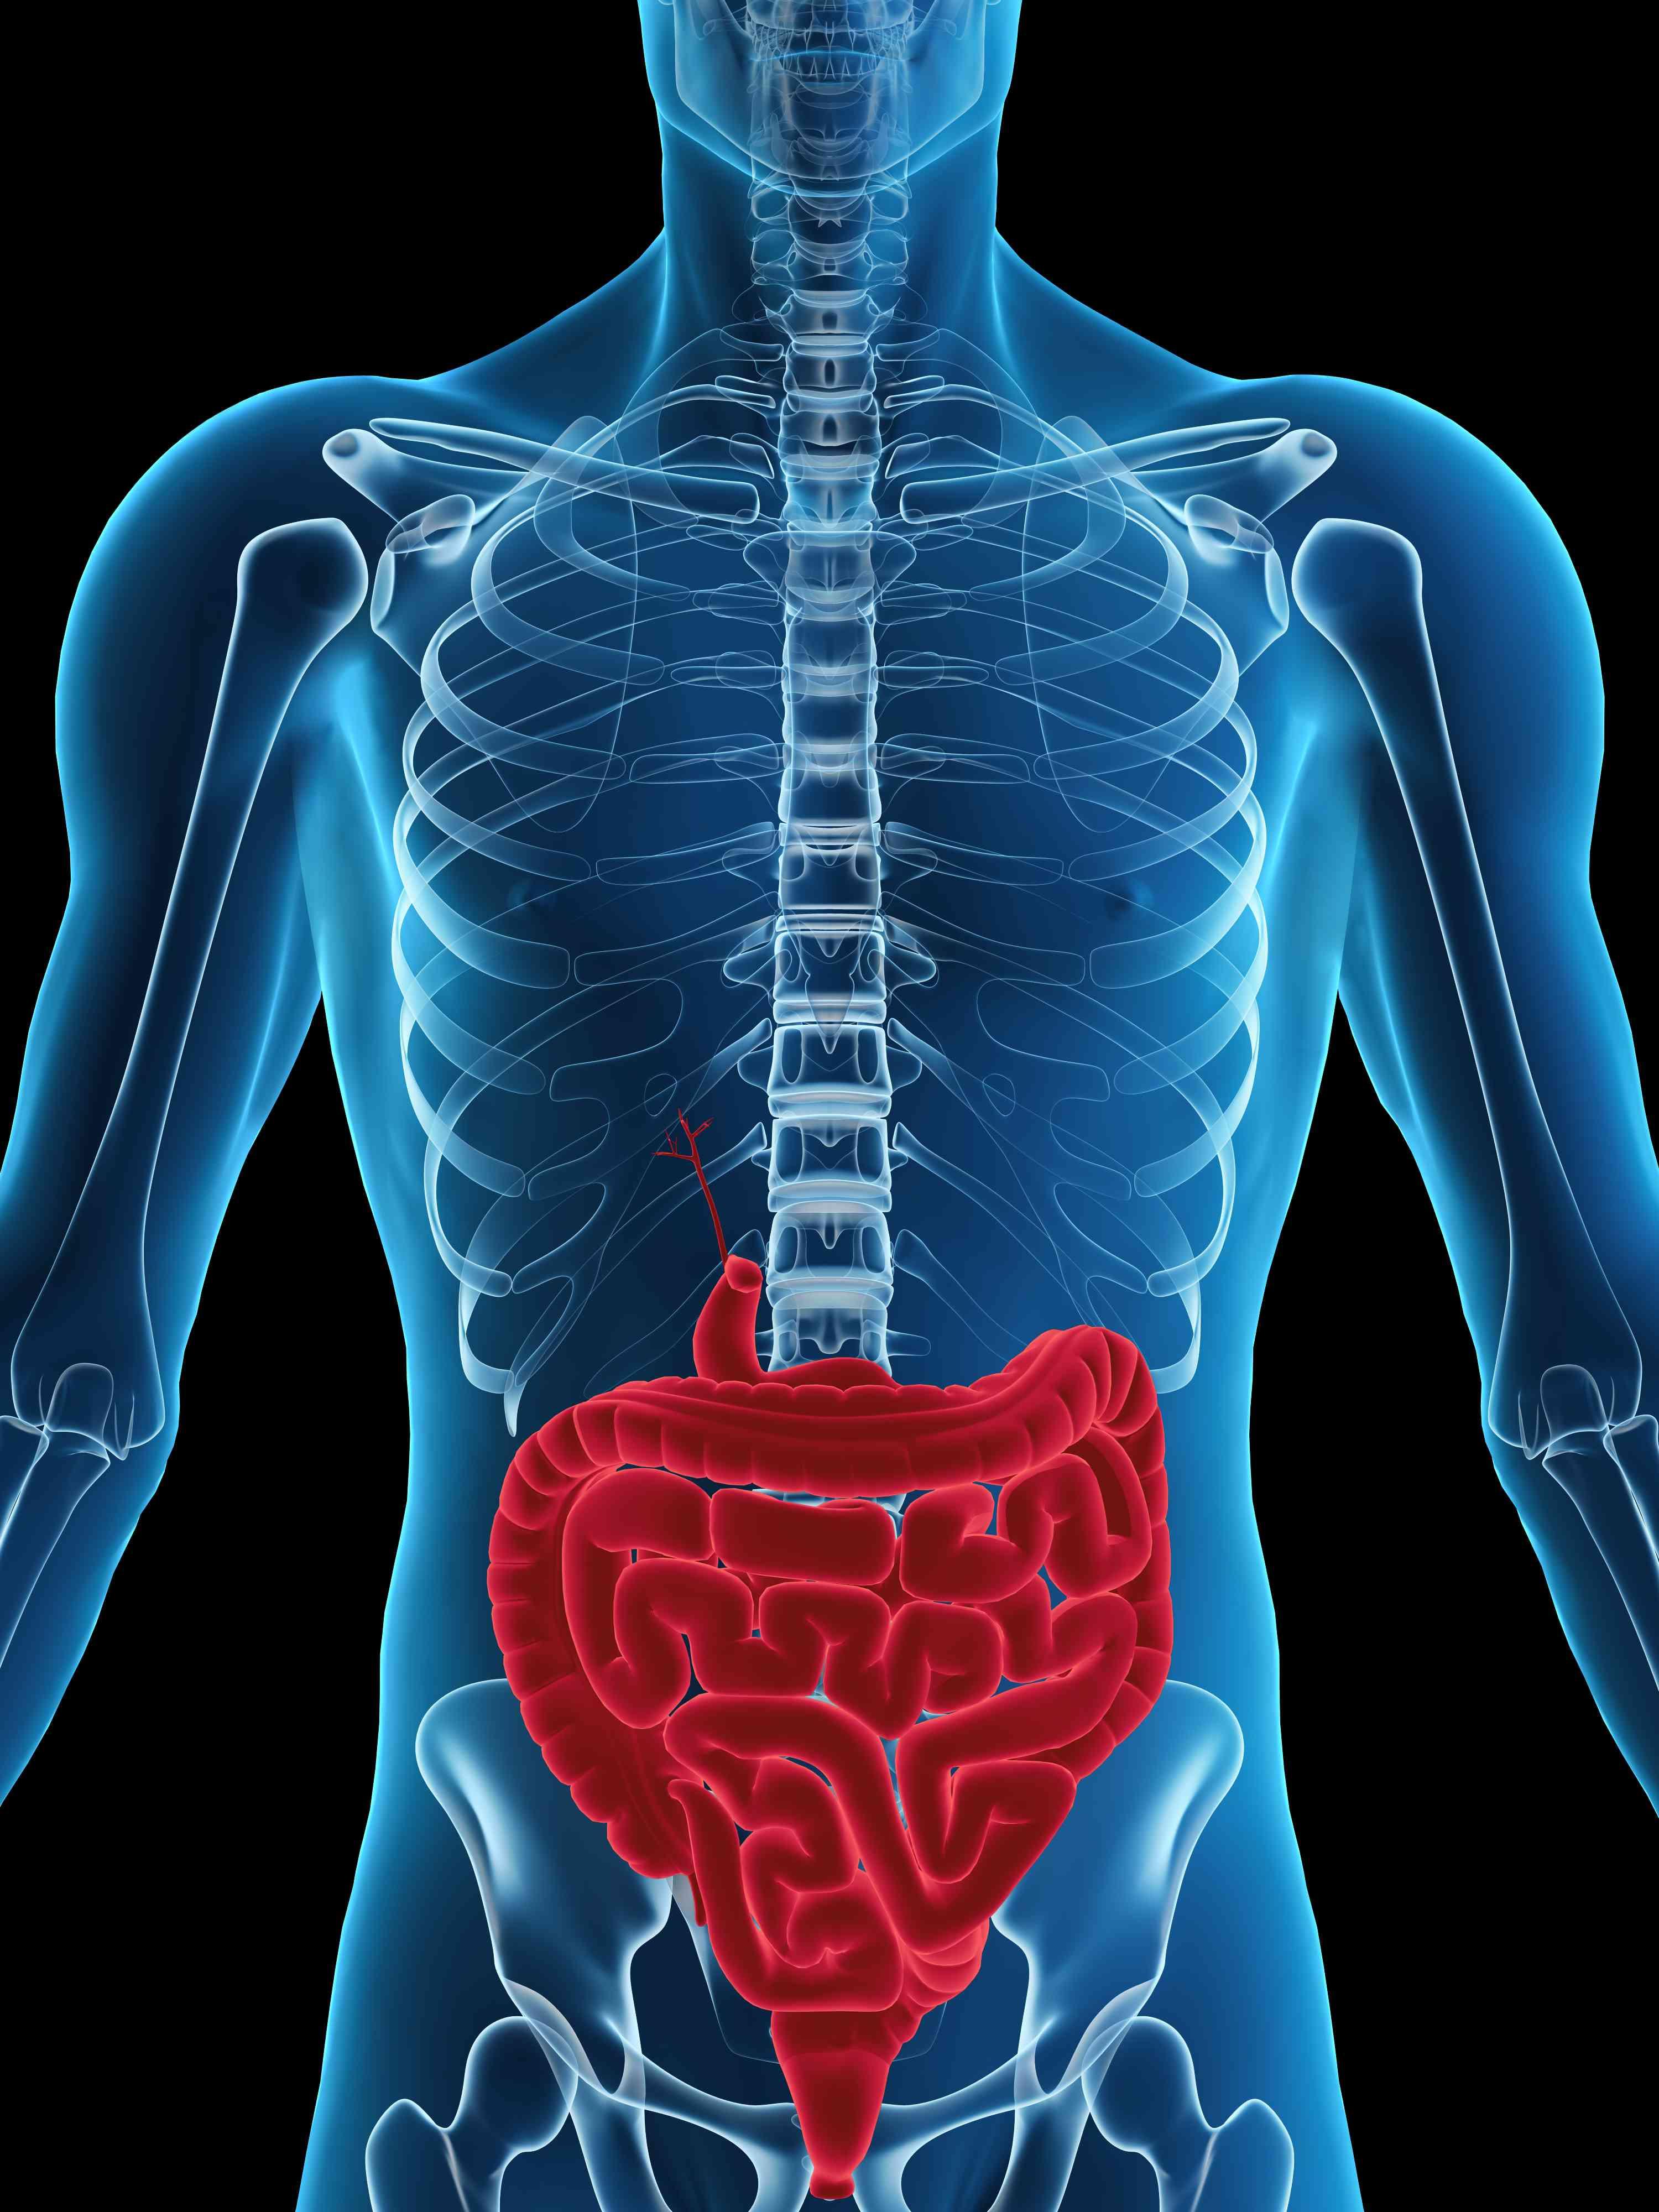 Digital illustration of the human digestive system